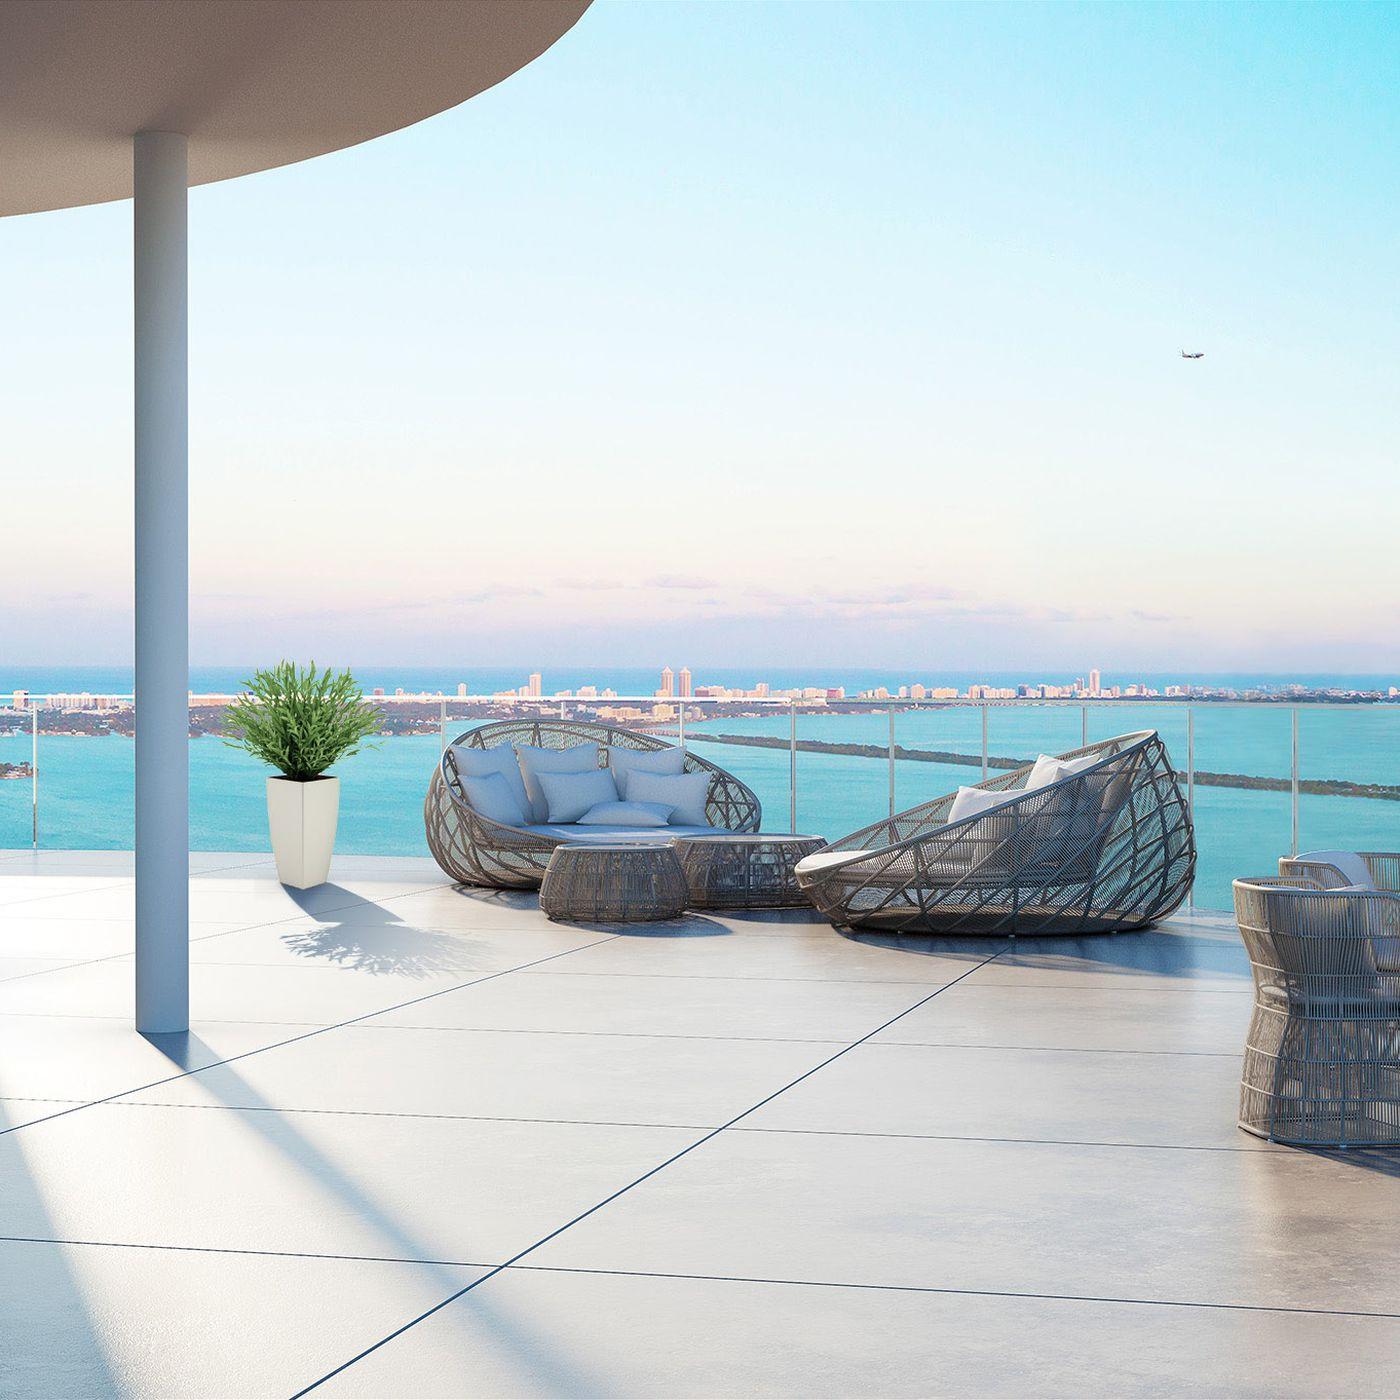 Miami\'s 10 biggest celebrity homes of 2017 - Curbed Miami